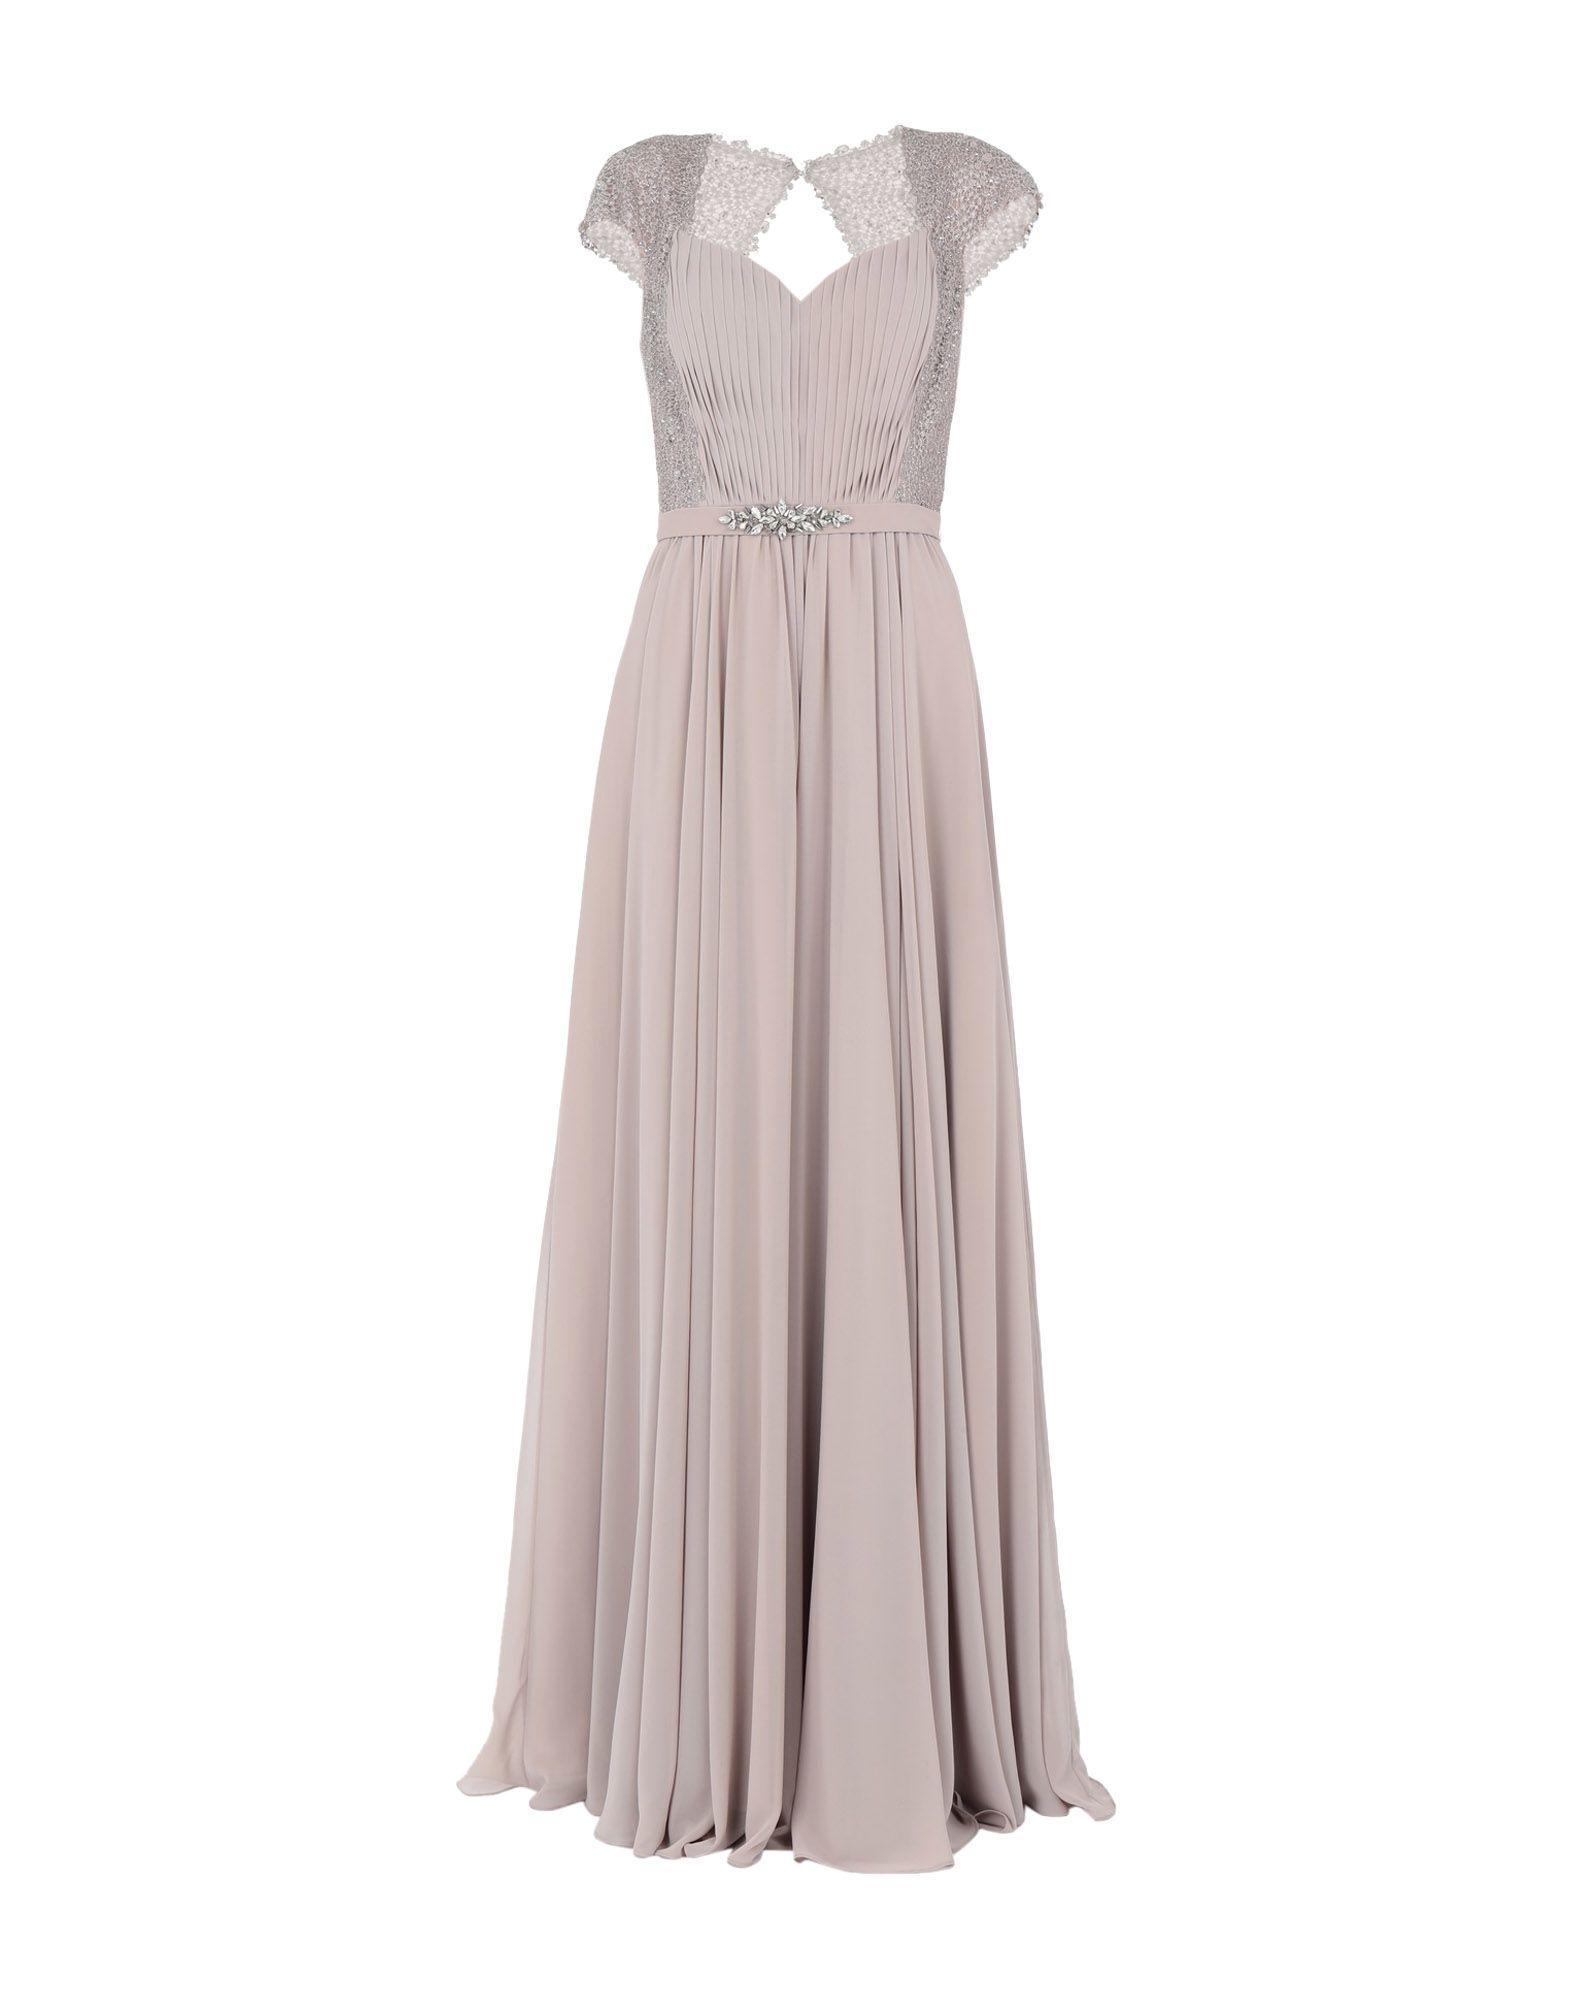 Фото - VIVIEN V. LUXURY Длинное платье v persie van basten 556688